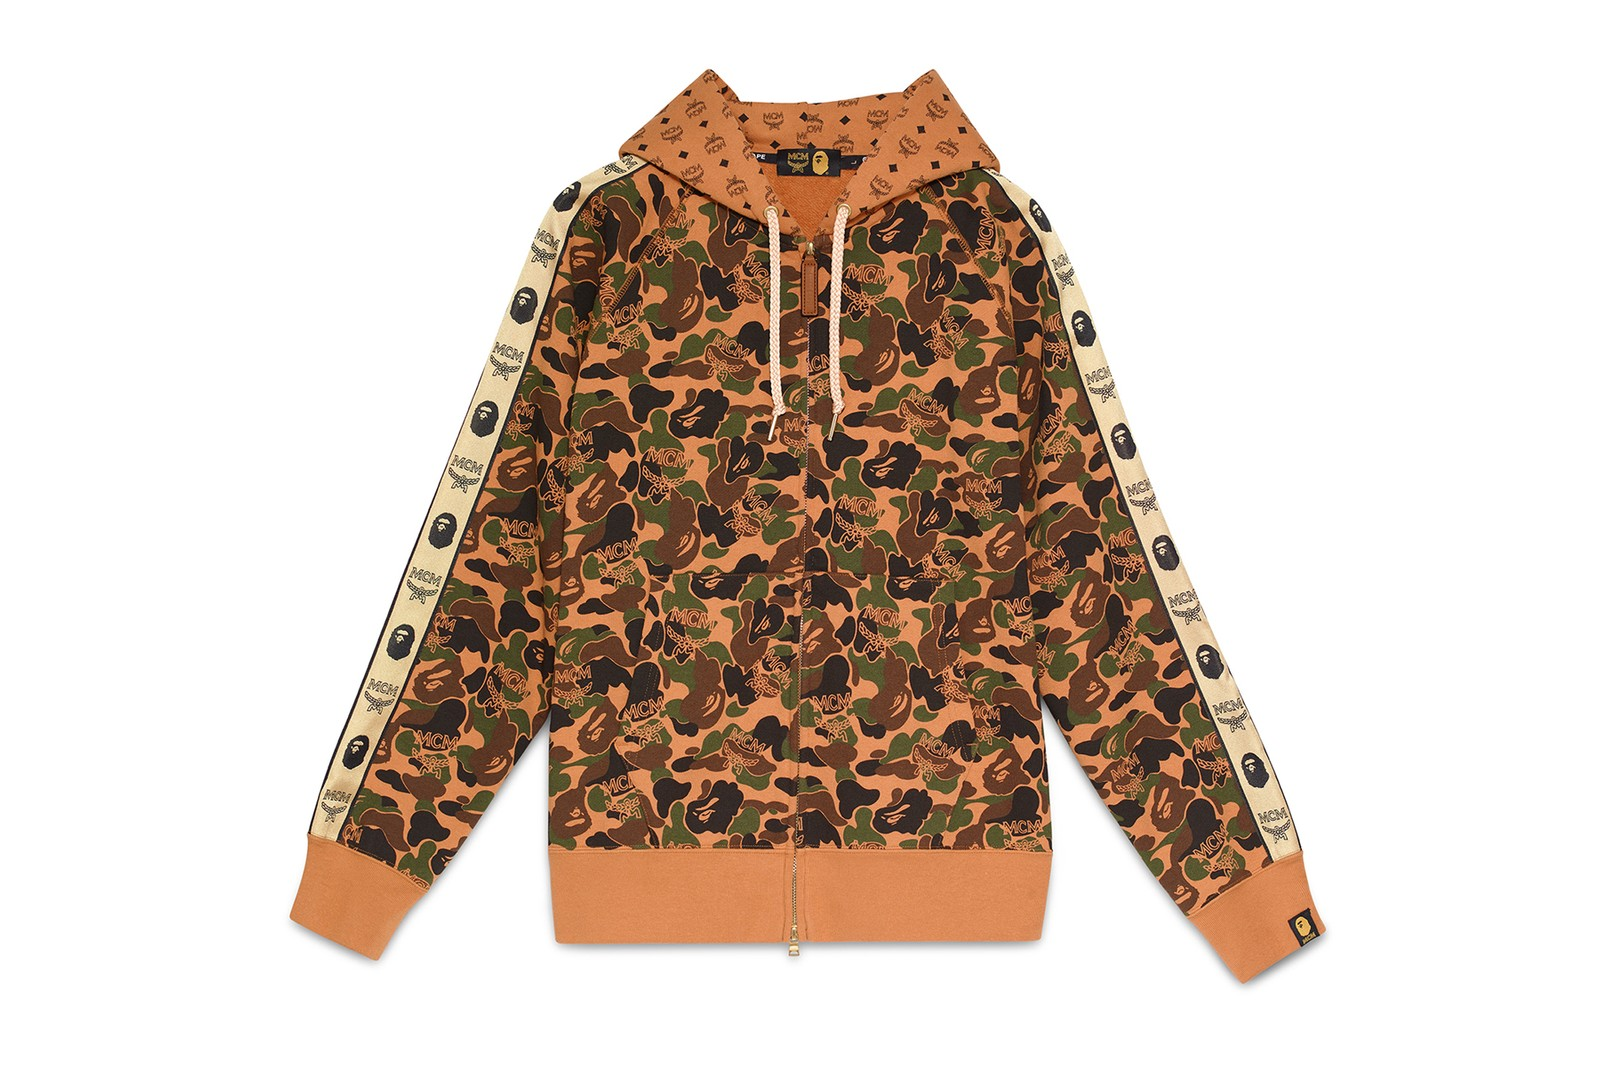 MCM x 베이프 협업 캡슐 컬렉션, 티셔츠, 카무플라주, 유인원, 럭셔리, 스트리트